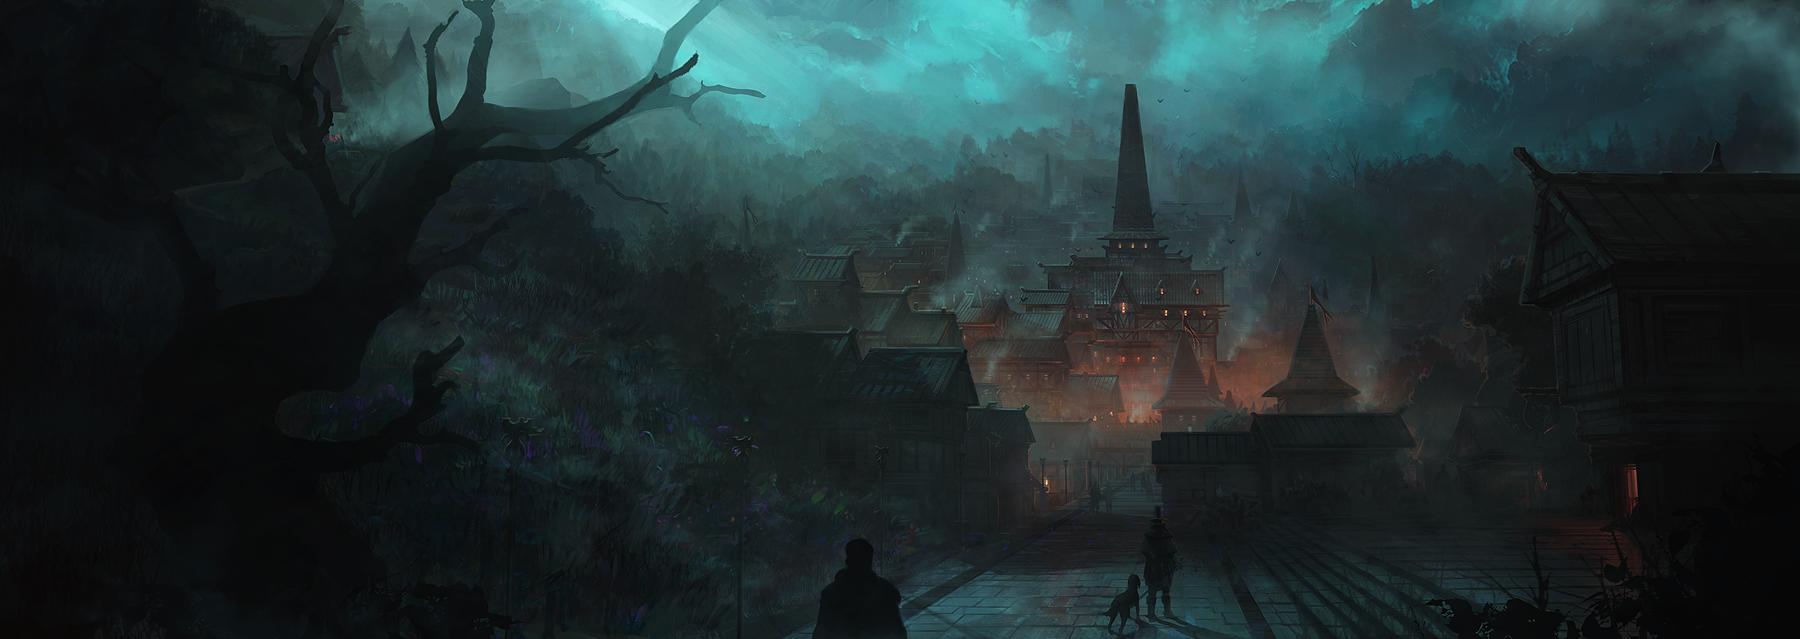 Green City by Yellomice